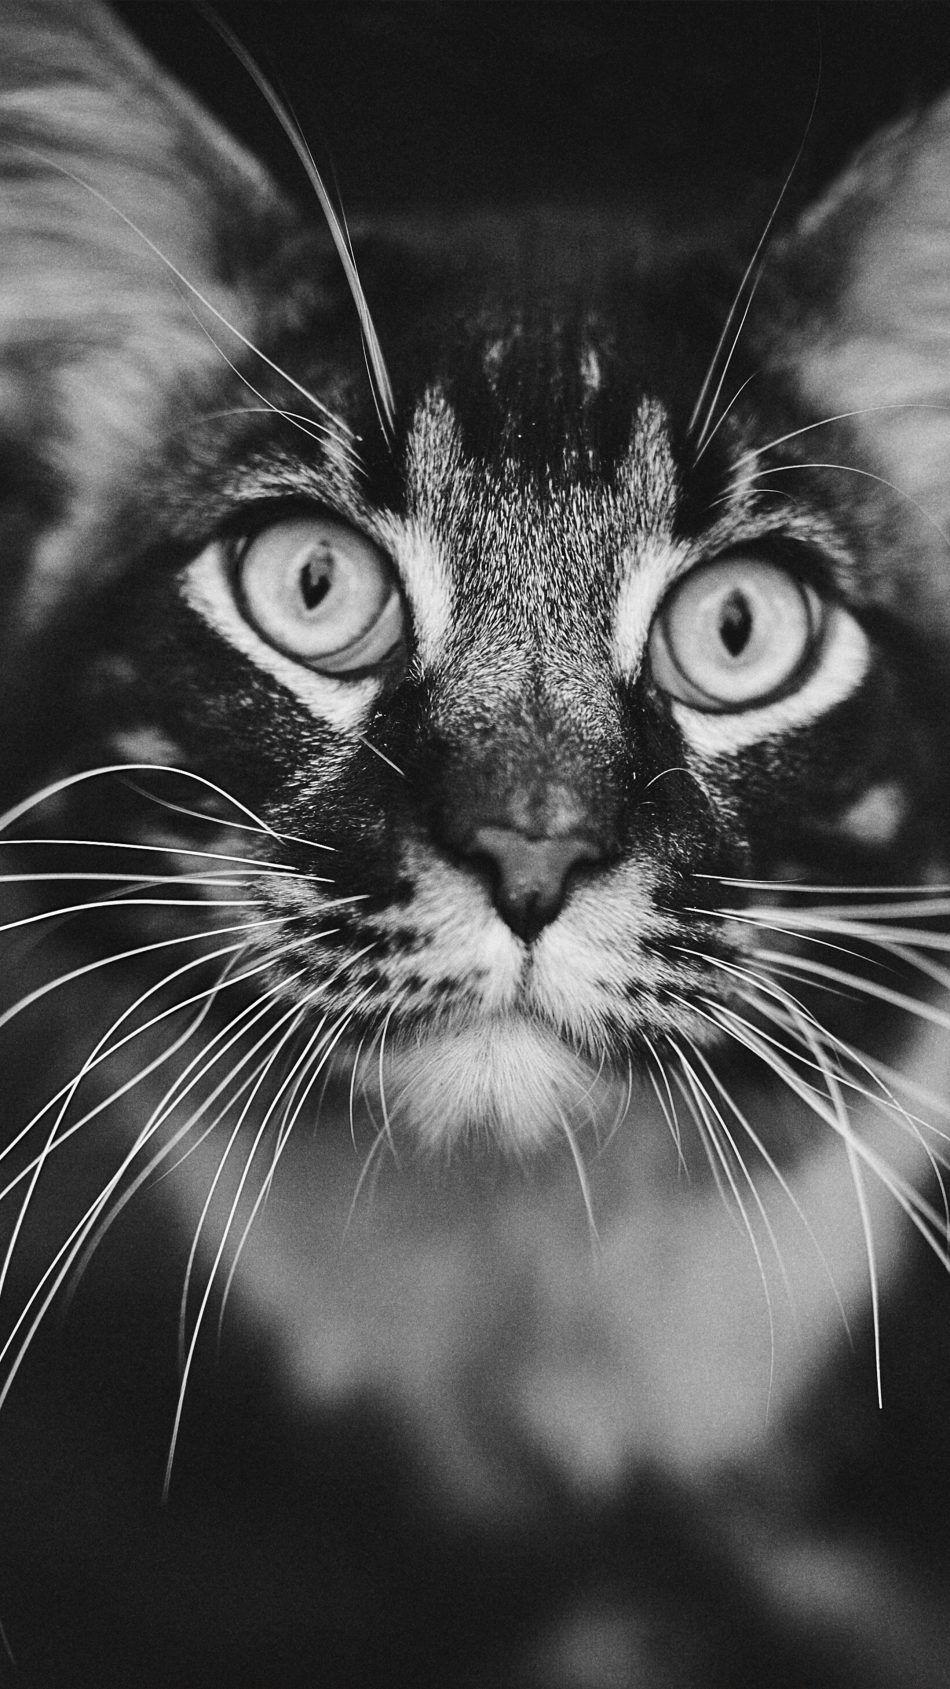 Staring Cat Black White 4k Ultra Hd Mobile Wallpaper Cute Cat Wallpaper Cats White Cat